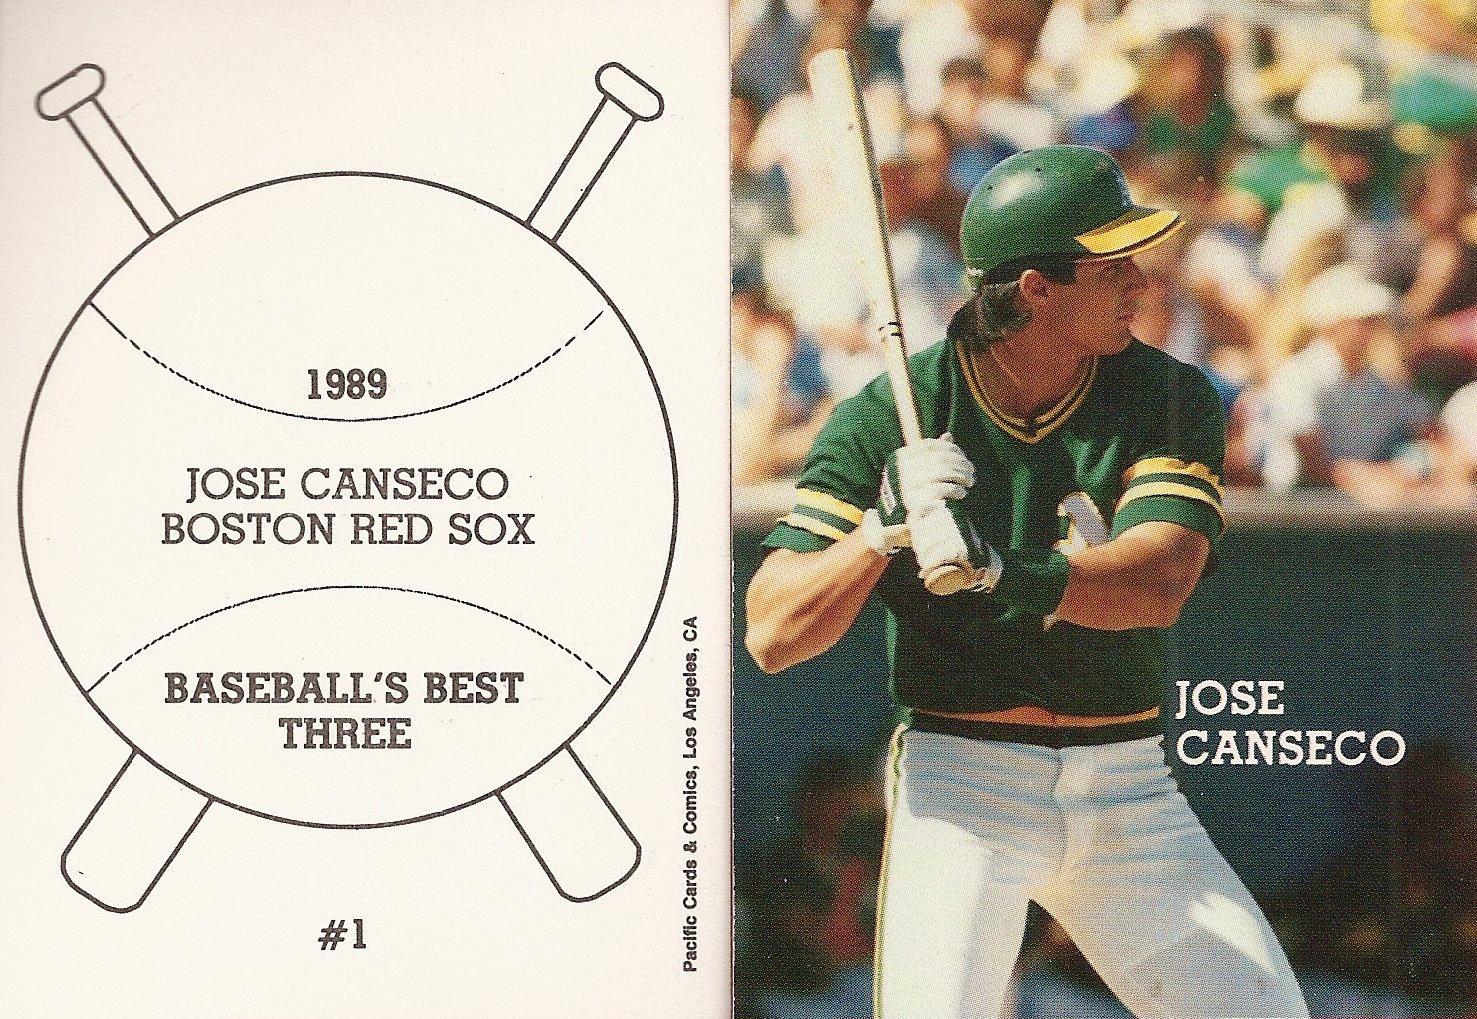 1989 Pacific Cards & Comics Baseballs Best Three